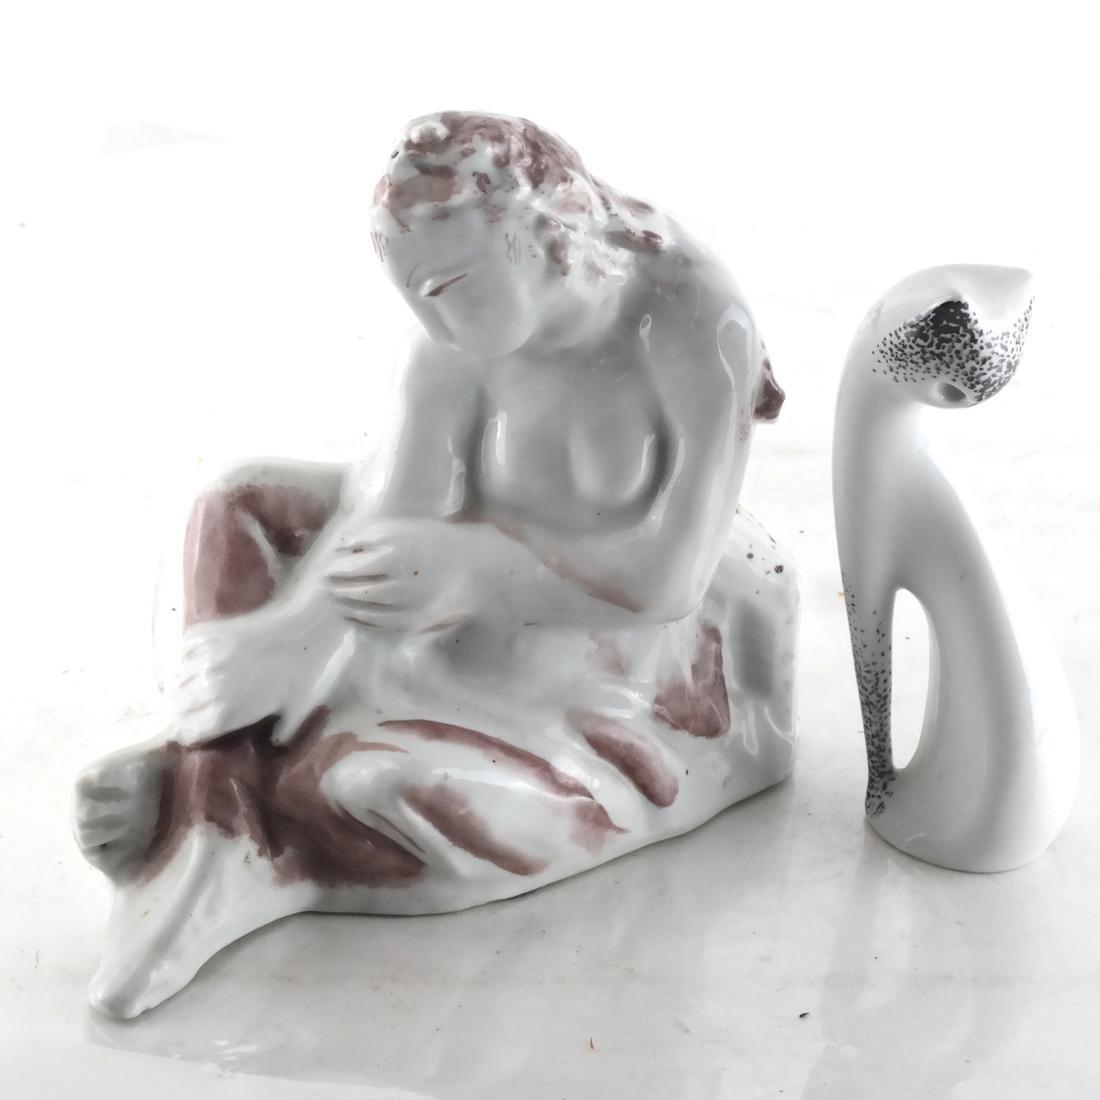 Two Ceramic Sculptures - Cat & Woman